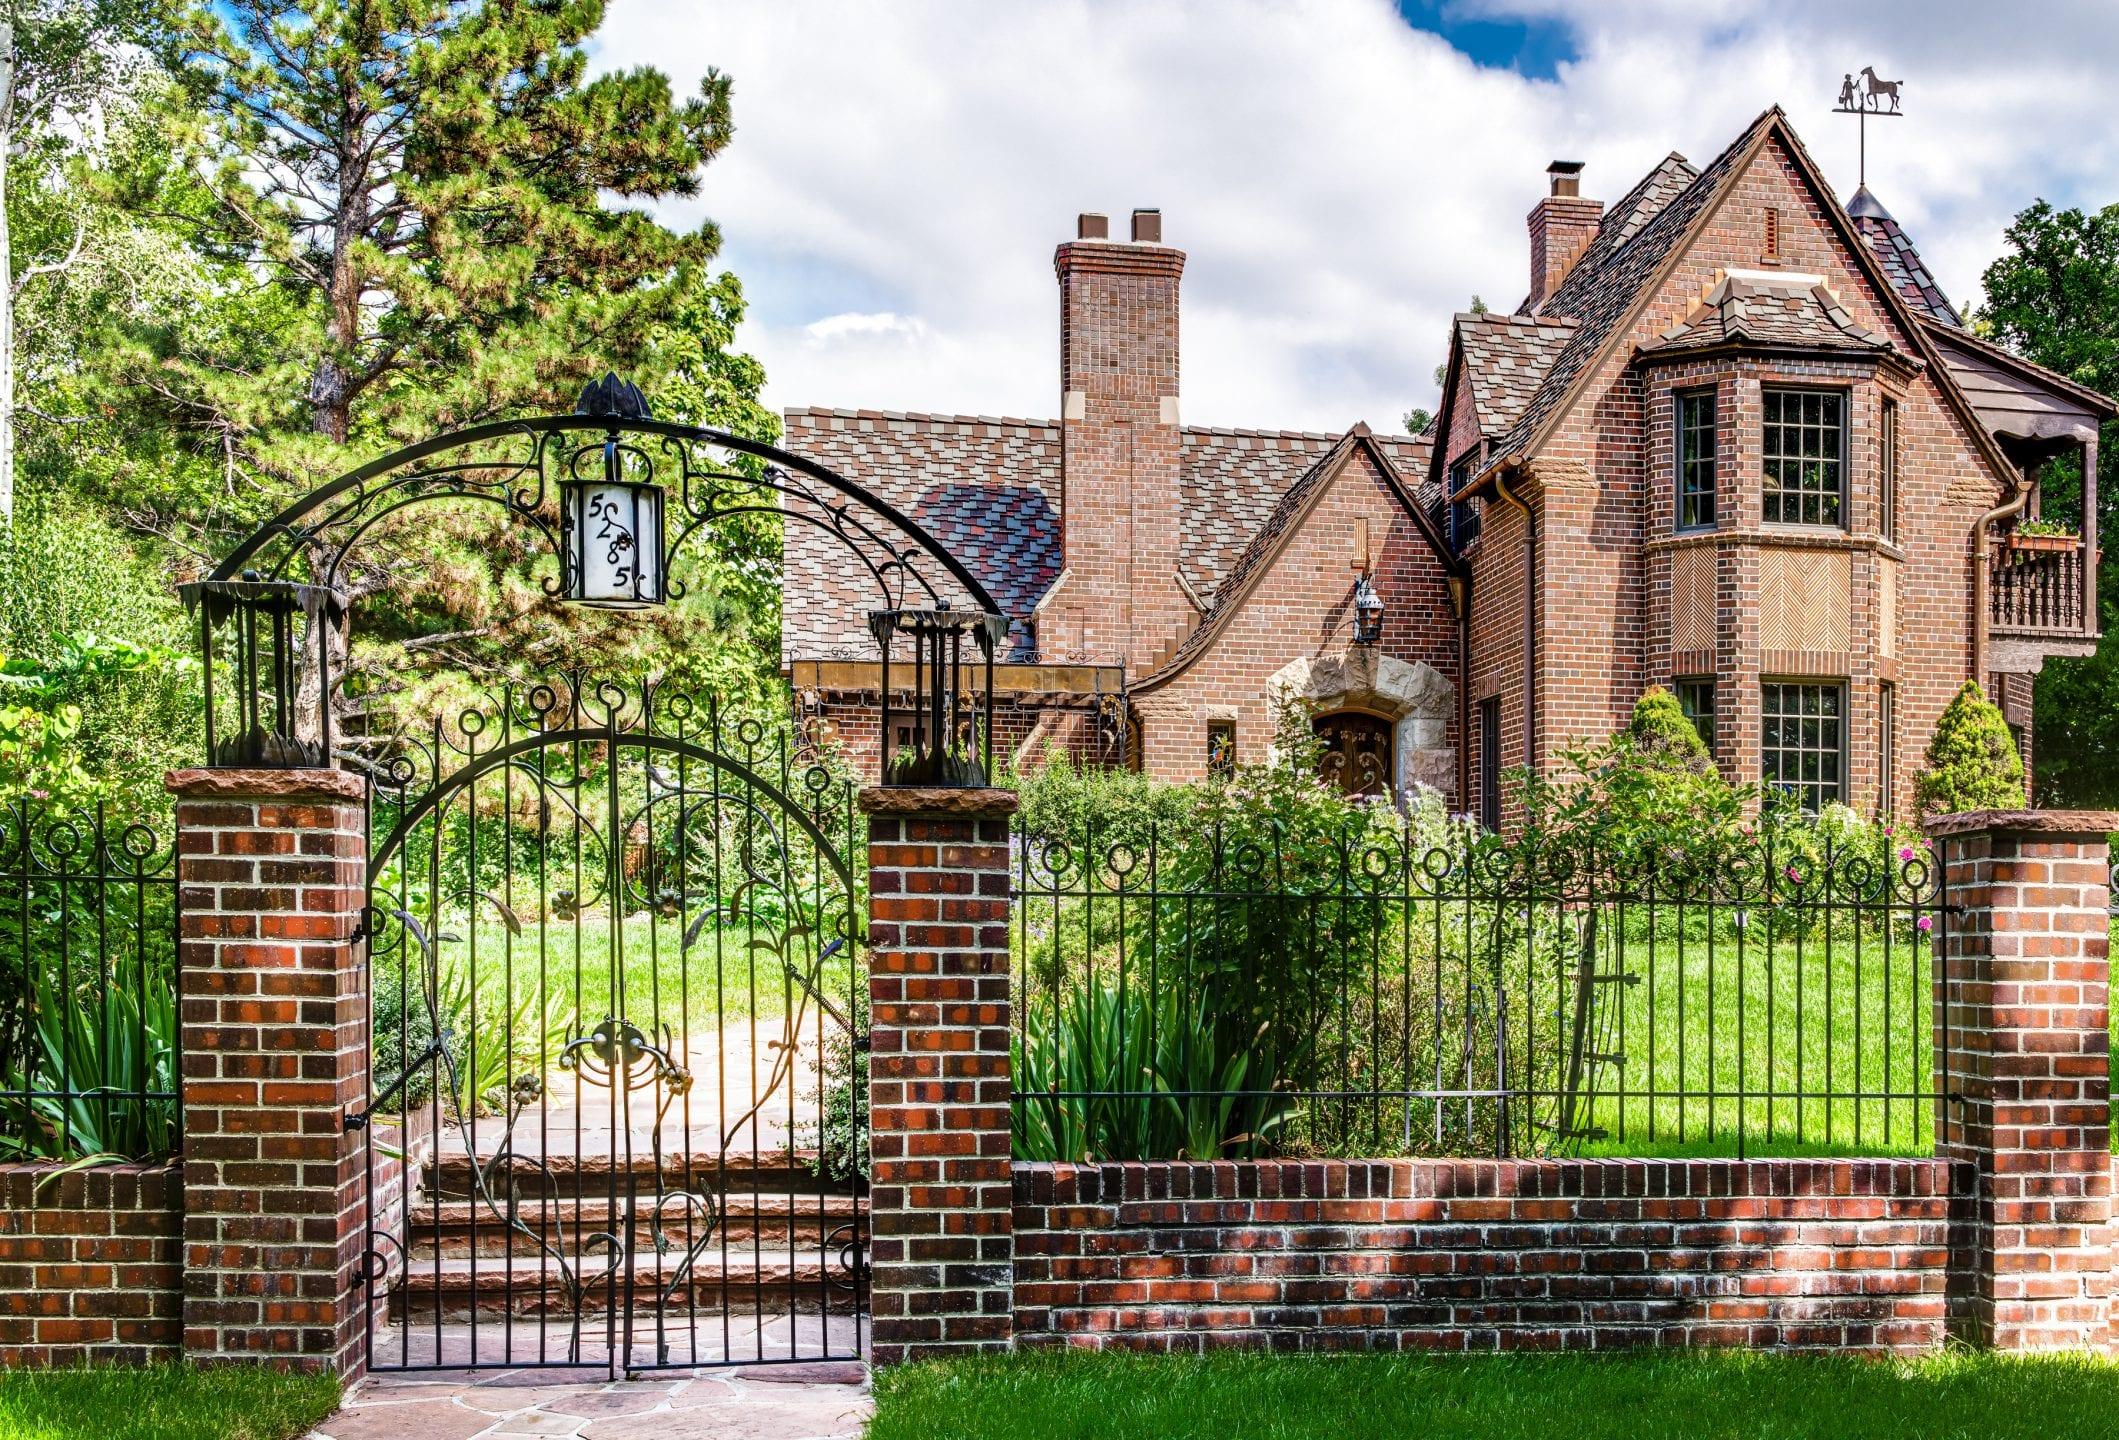 Private Residence - Denver Ludowici Roof Tile